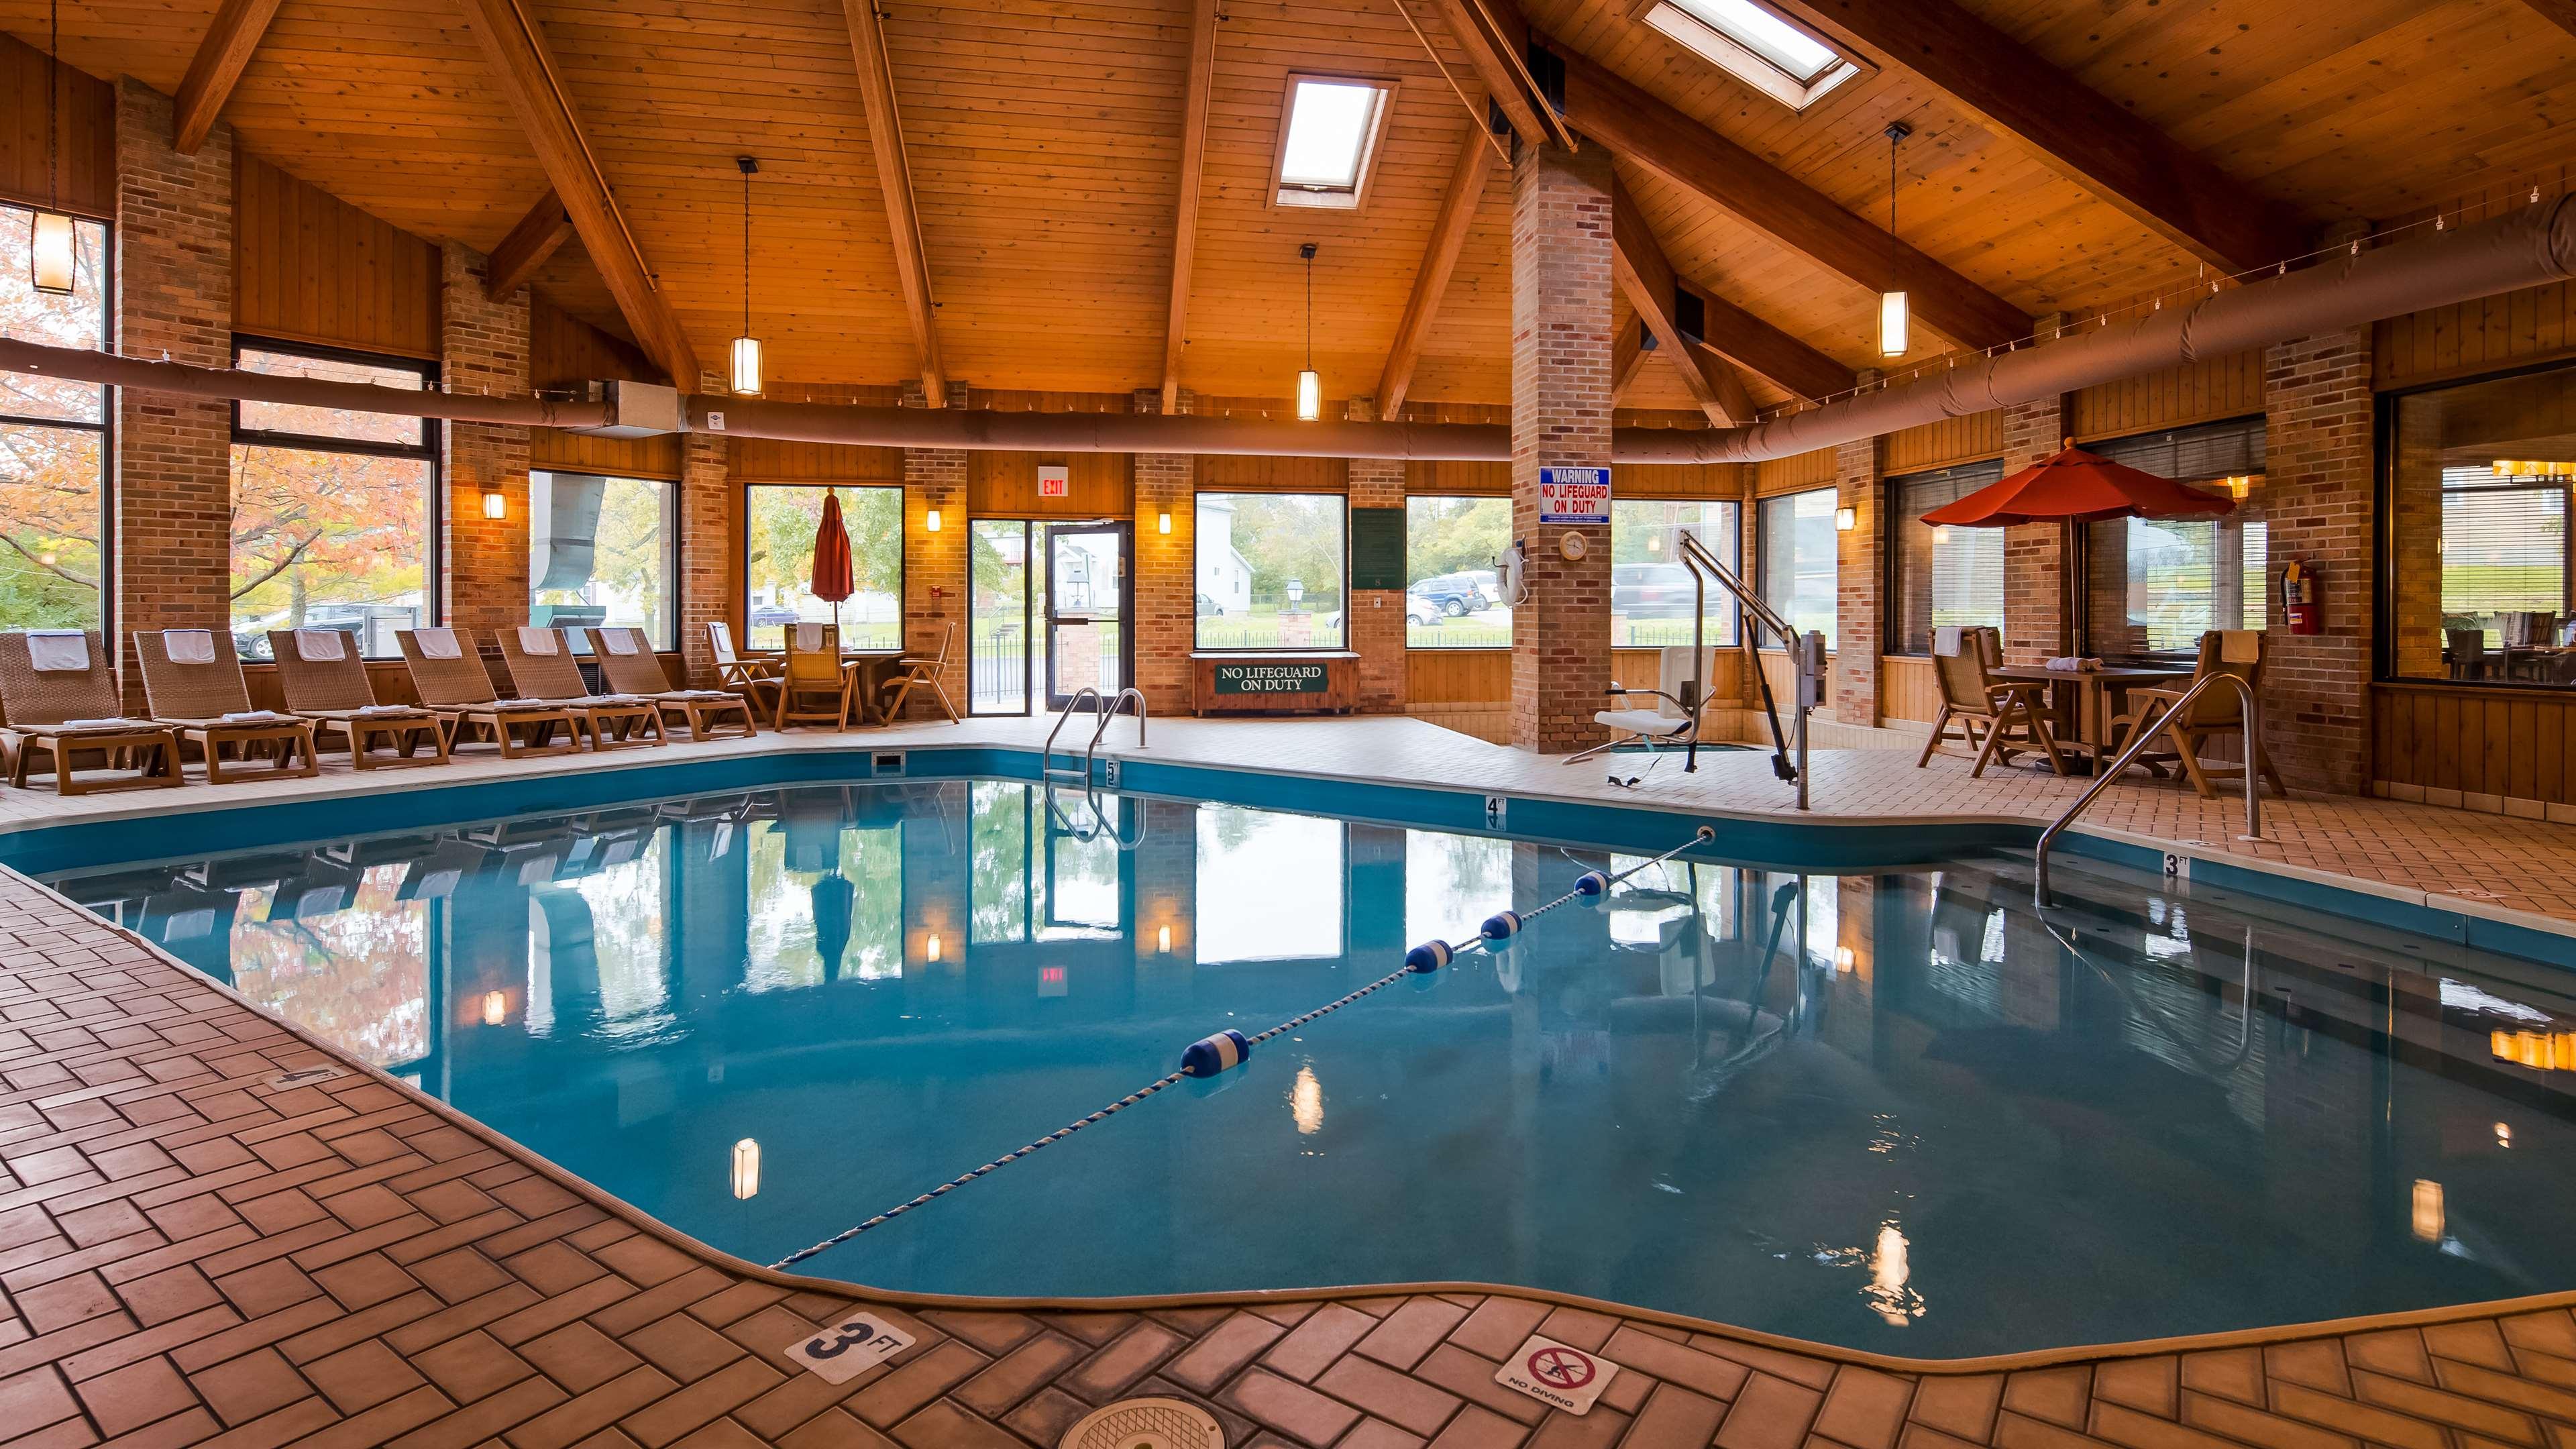 Best Western Sycamore Inn image 10